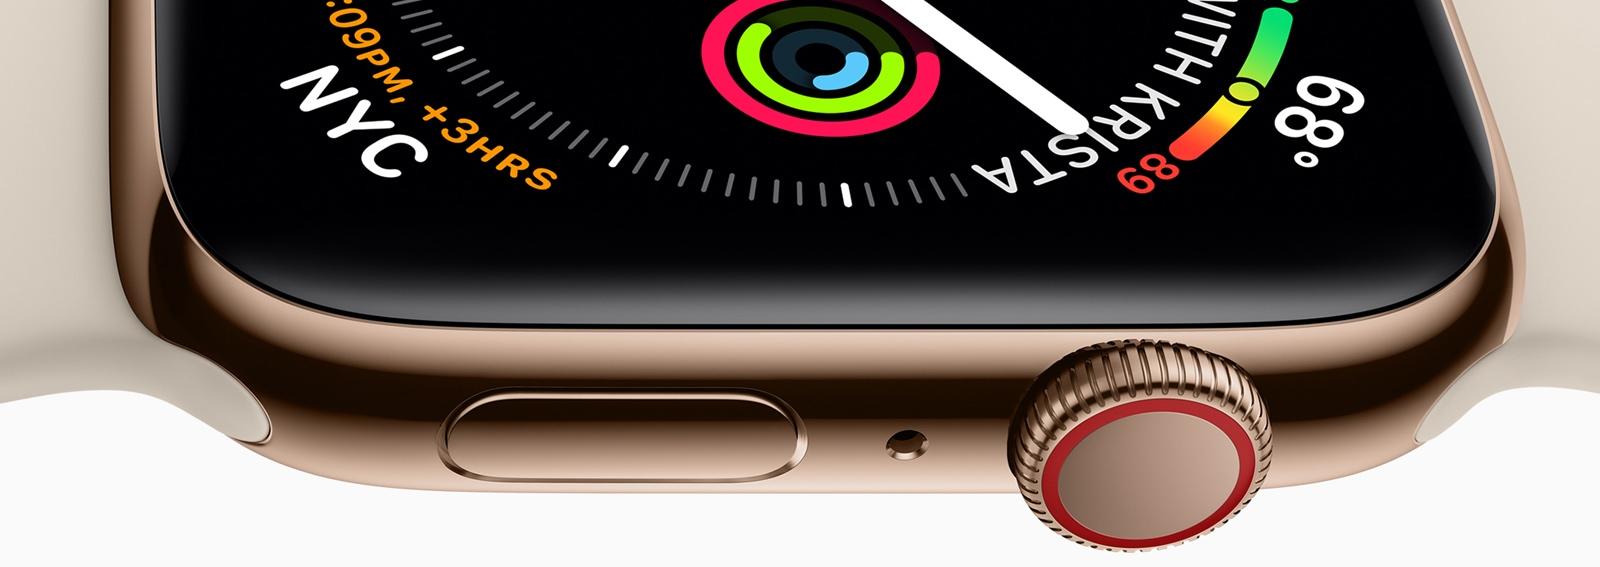 apple-watch-series4 desktop